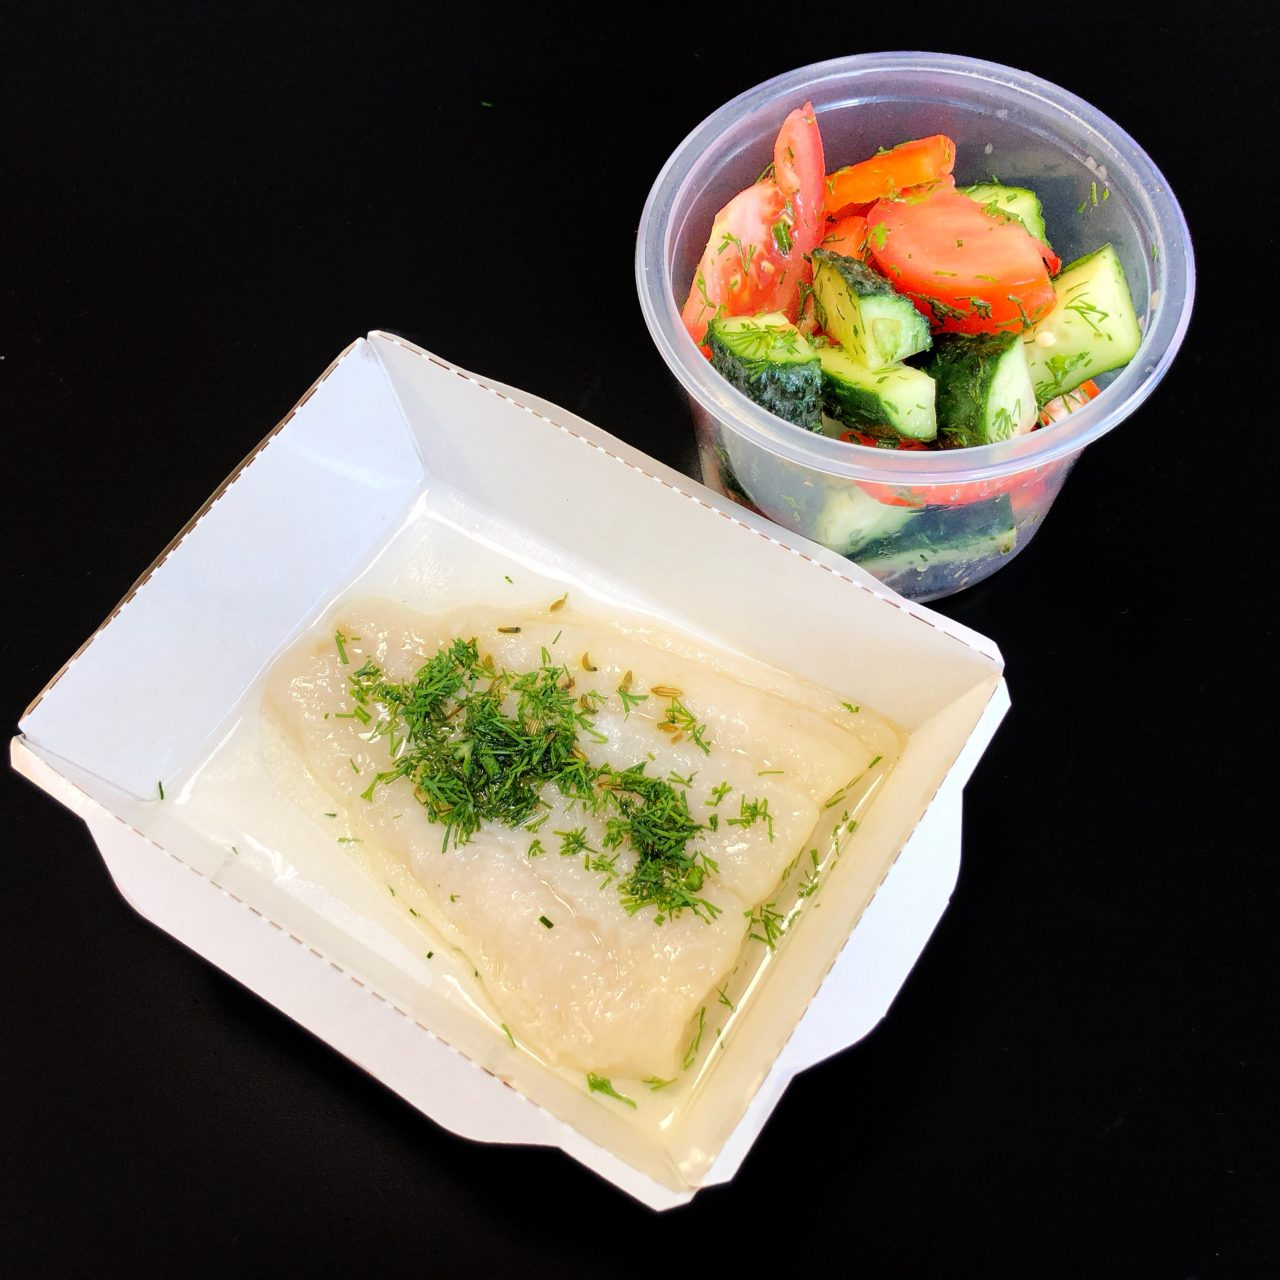 Филе палтуса с овощным салатом